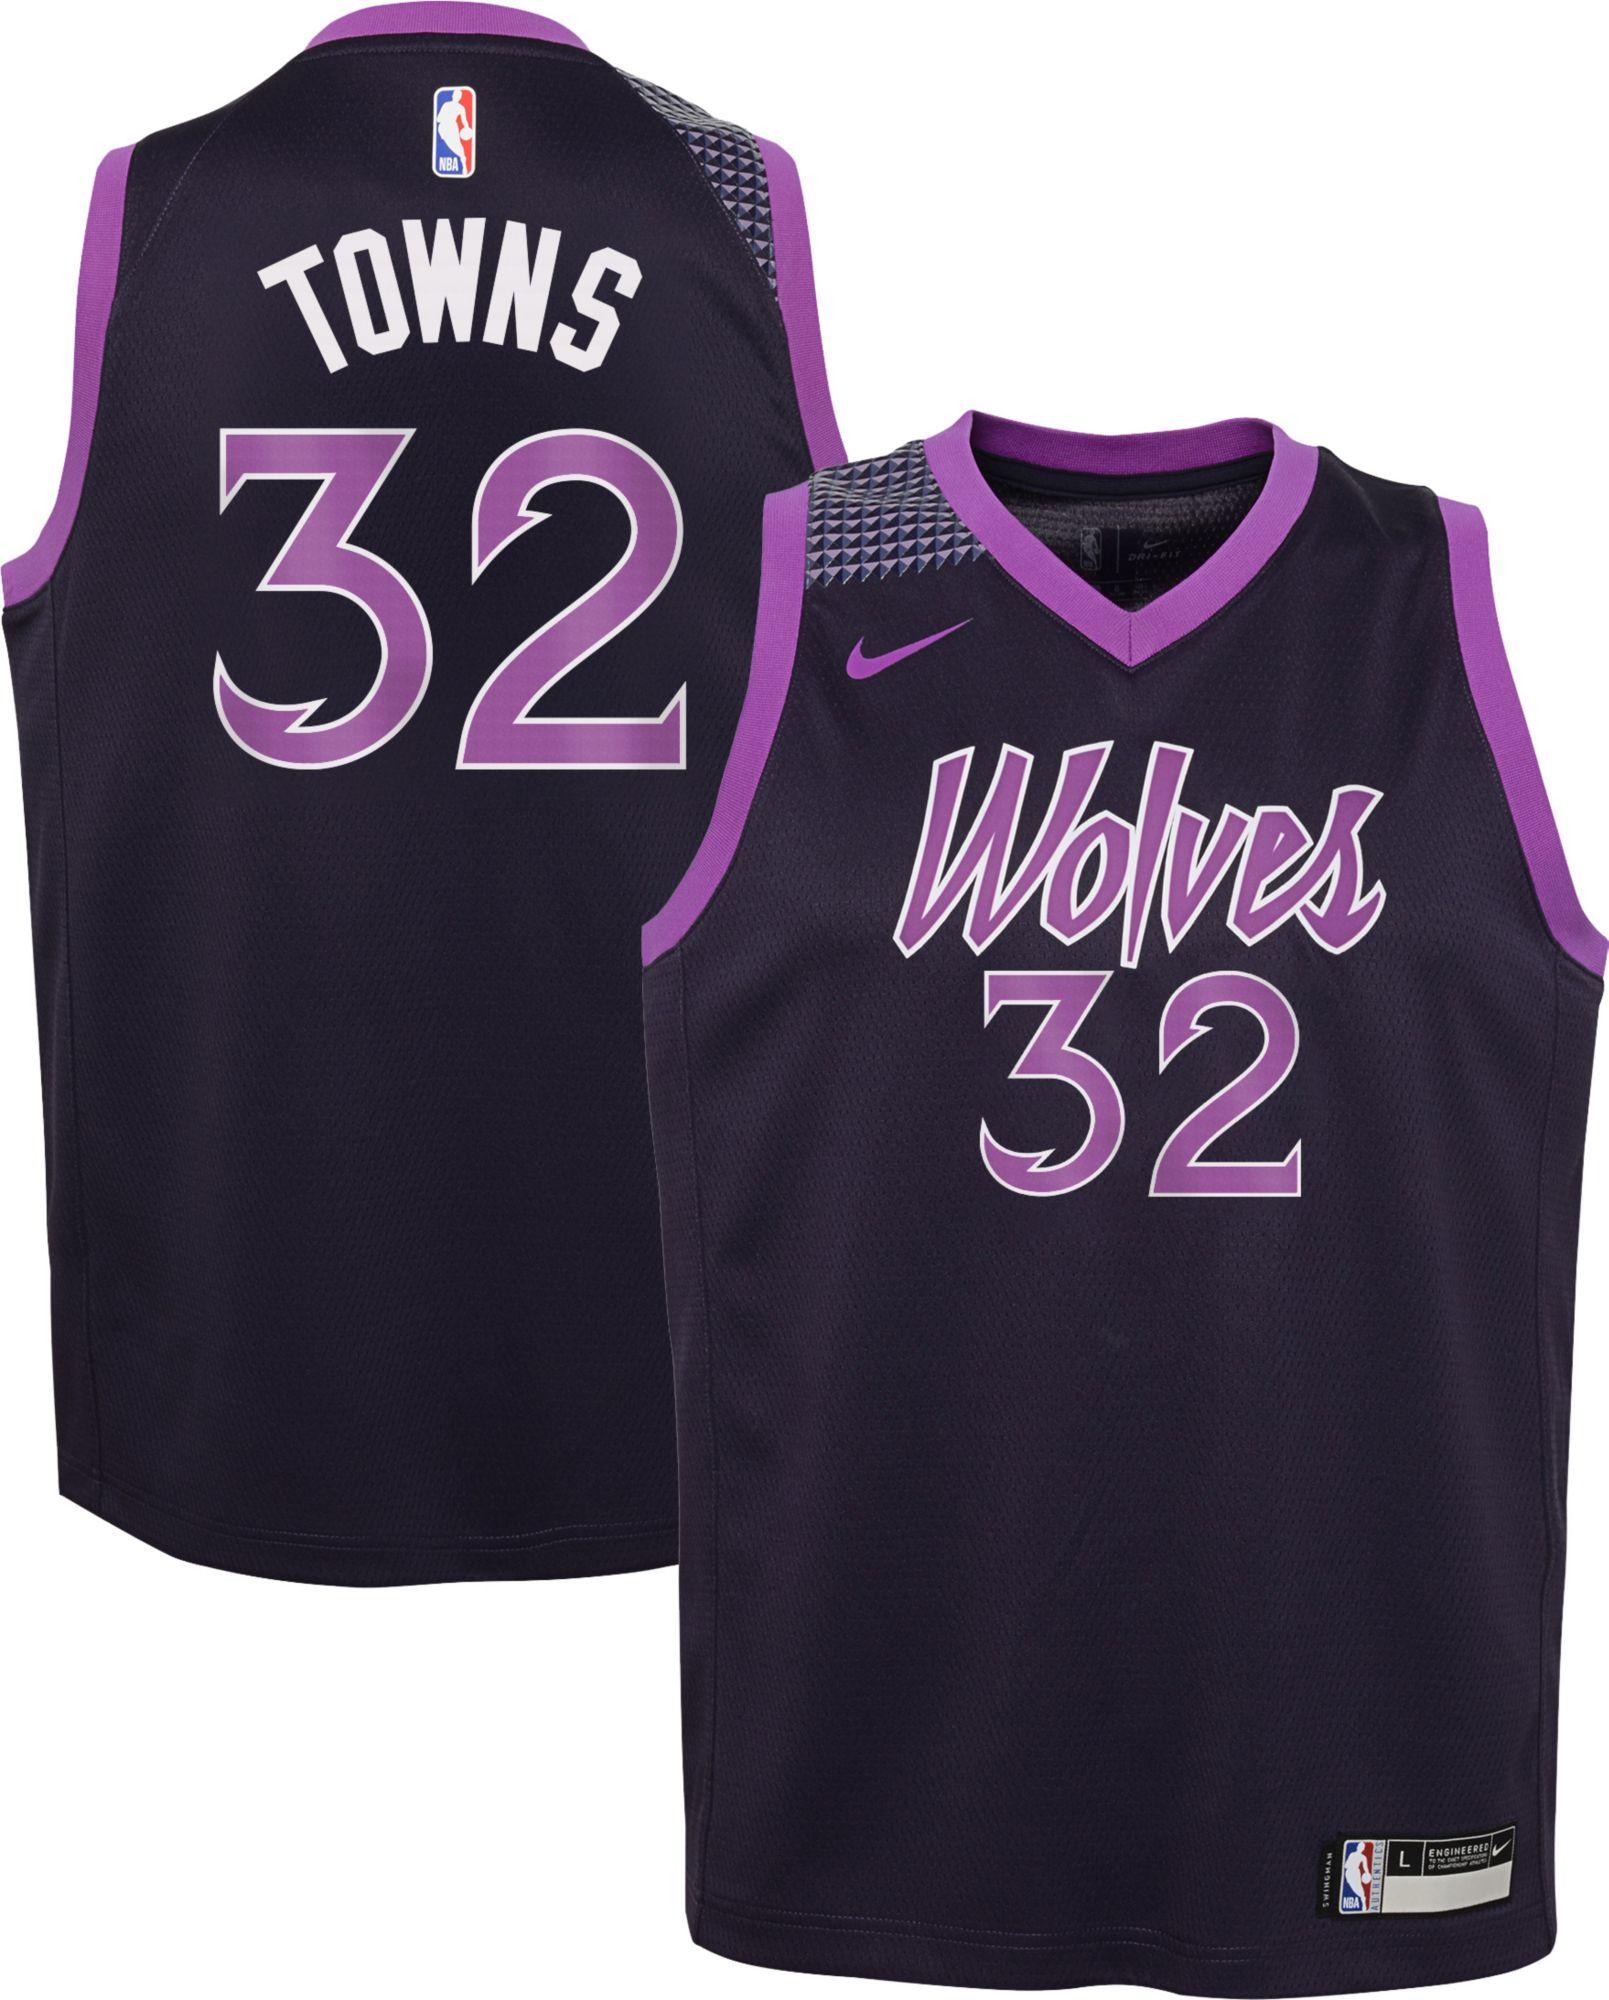 cheaper 4f849 c28da Nike Youth Minnesota Timberwolves Karl-Anthony Towns Dri-FIT ...